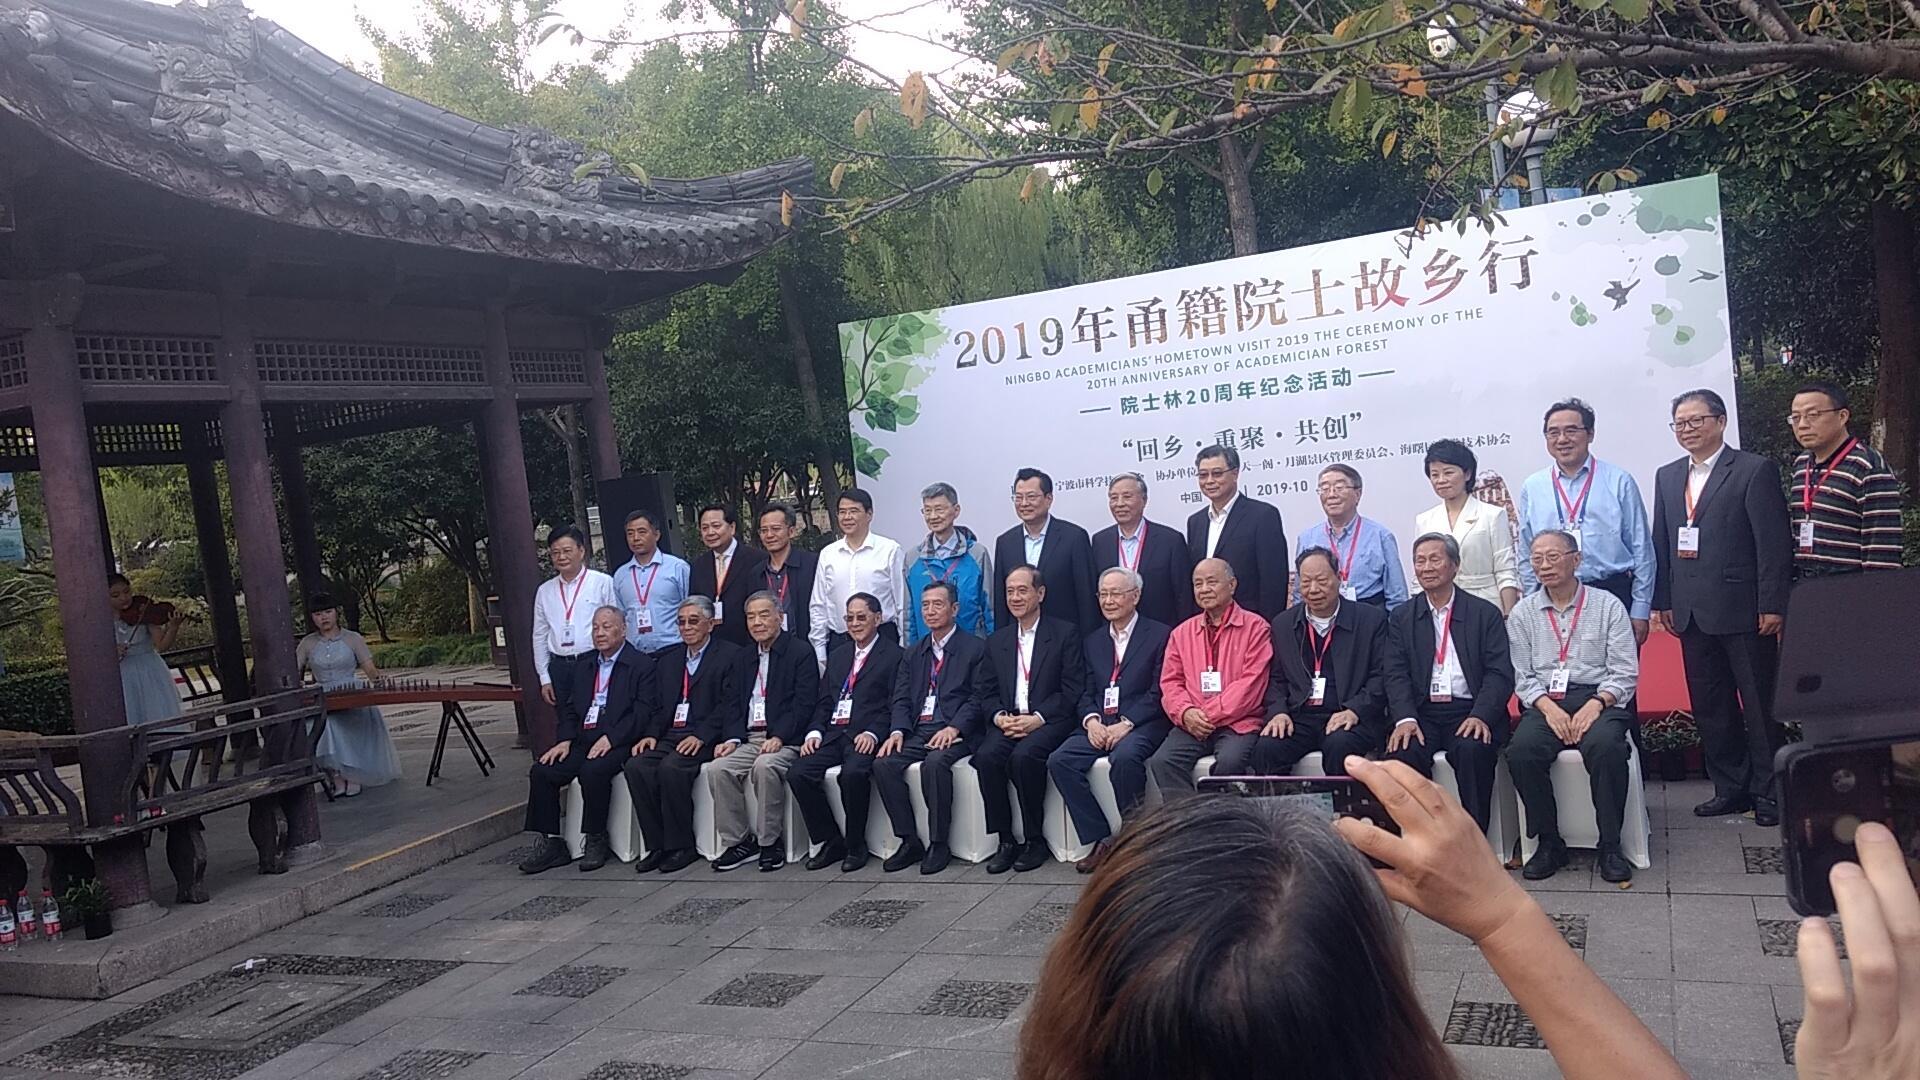 http://www.k2summit.cn/jiaoyuxuexi/1200823.html